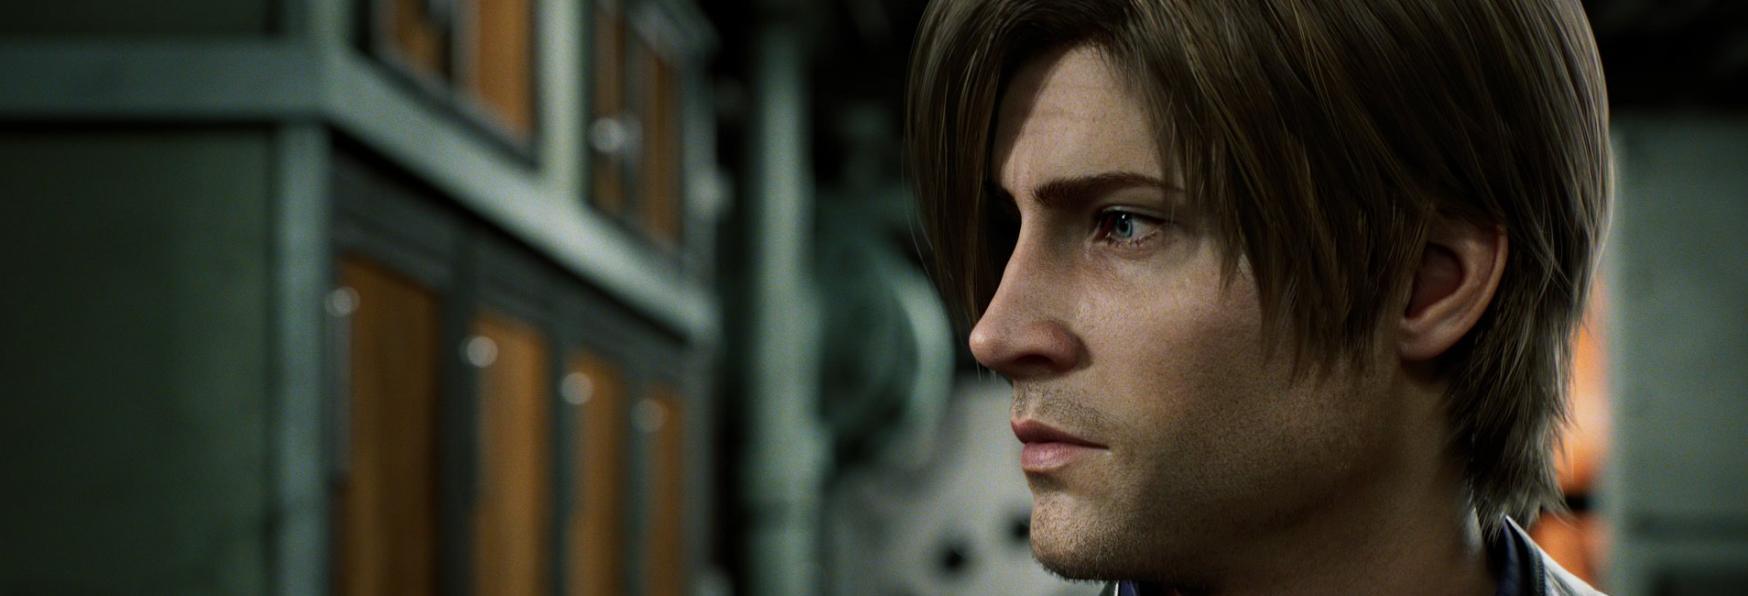 Resident Evil: Infinite Darkness - Recensione della nuova Serie TV targata Netflix